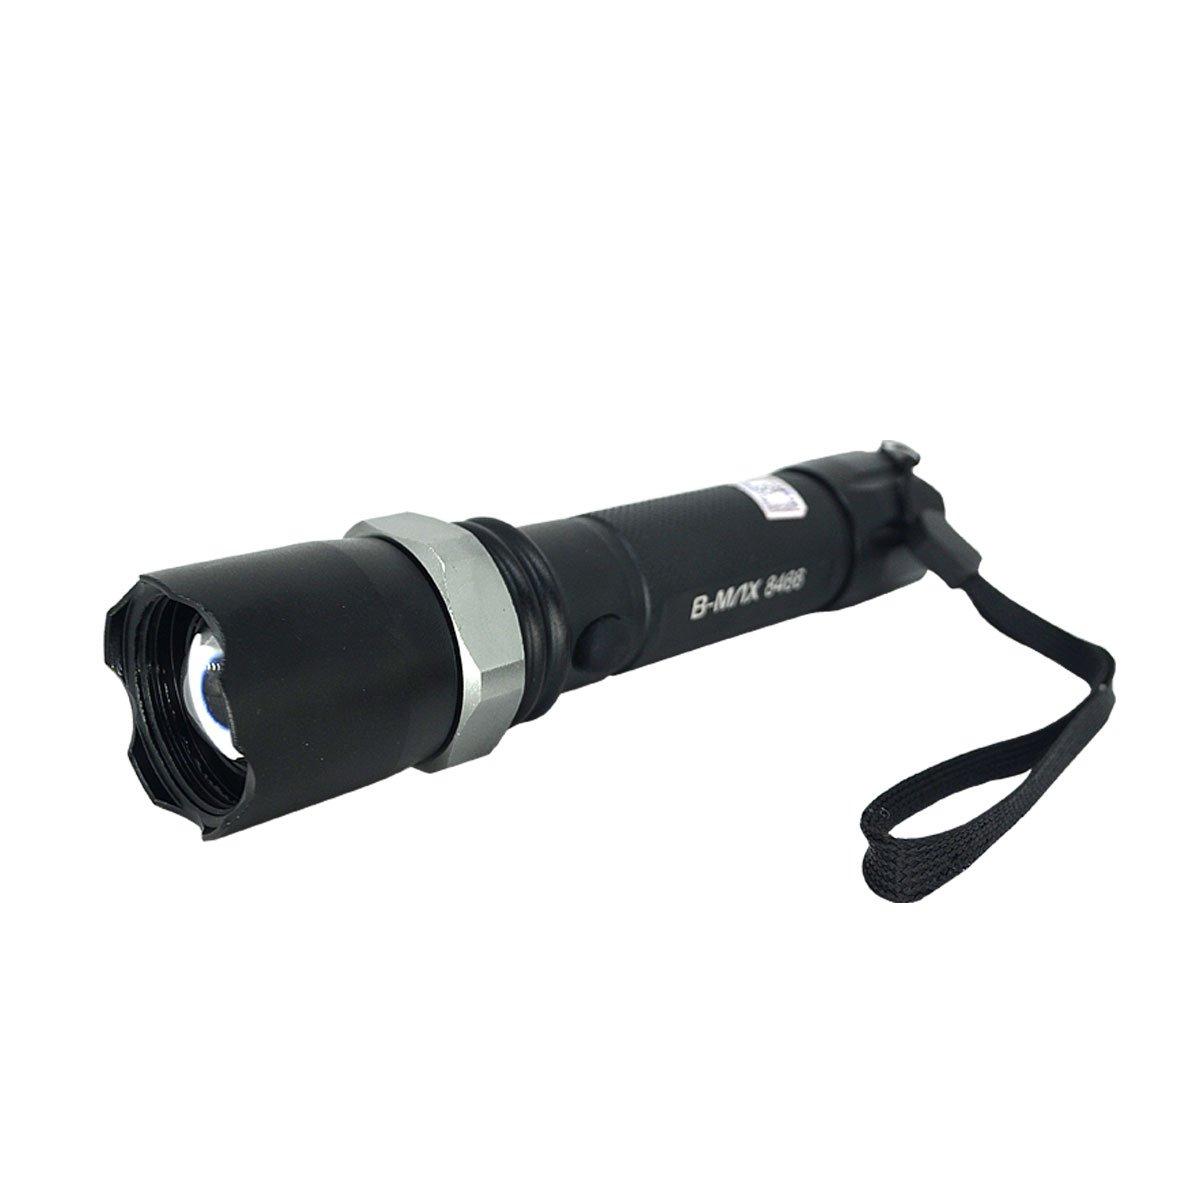 Lanterna B-Max Swat BM-8477 Recarregável C/ Sinalizador